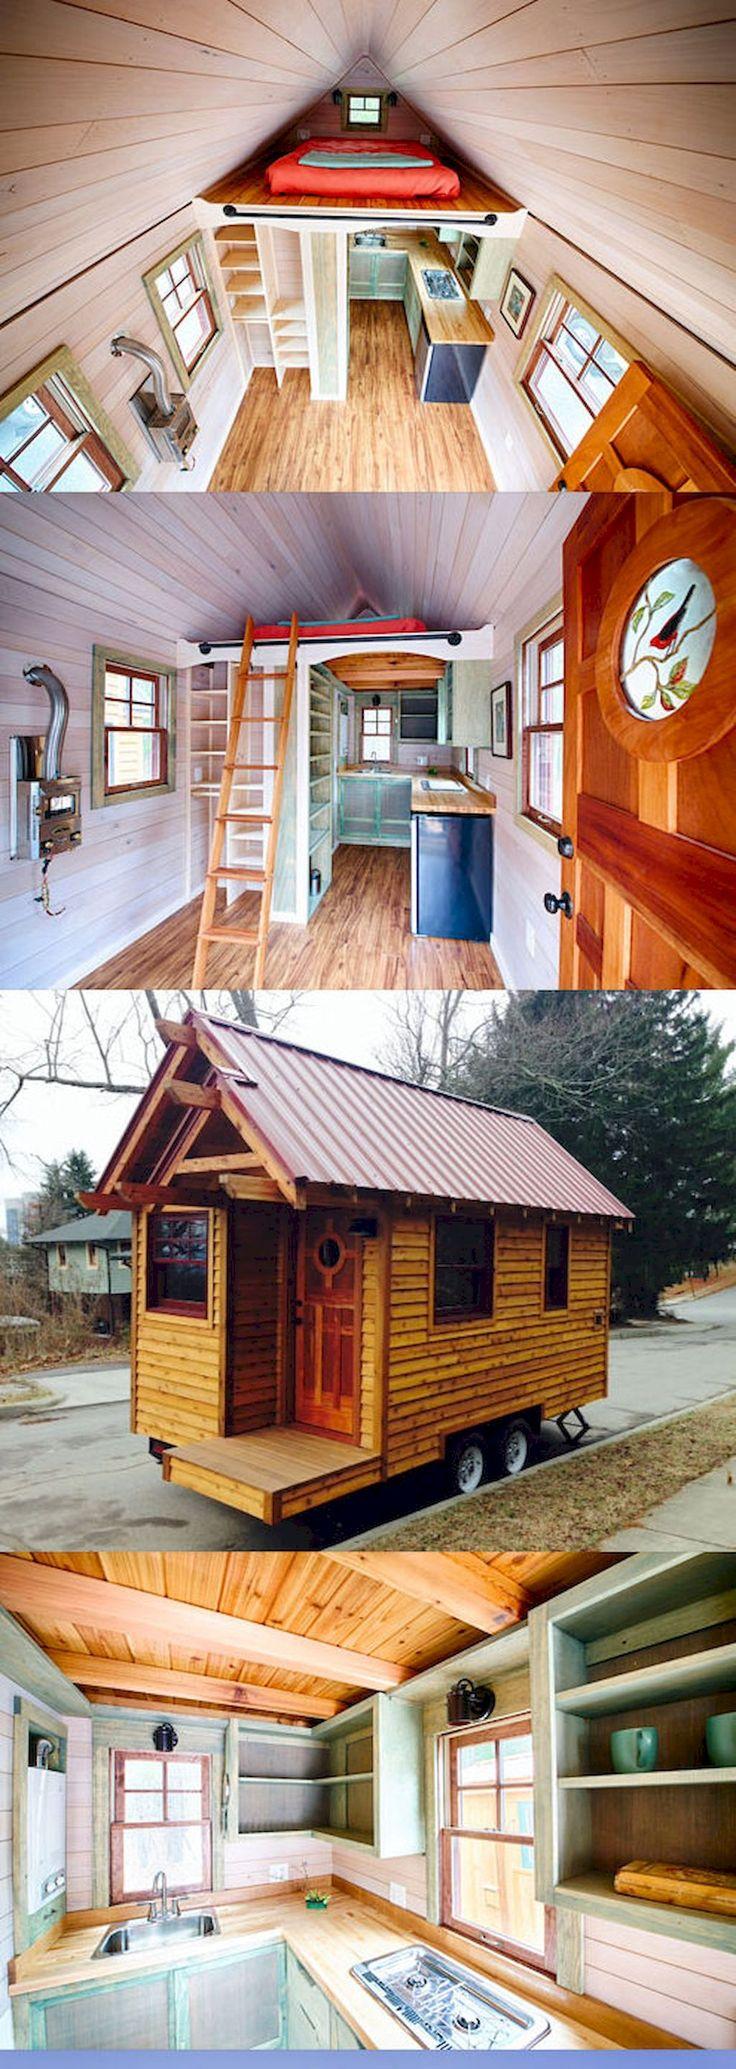 Cool 65 Best RVs and Camper Van Interior Design Ideas https://homstuff.com/2017/09/17/65-best-rvs-camper-van-interior-design-ideas/